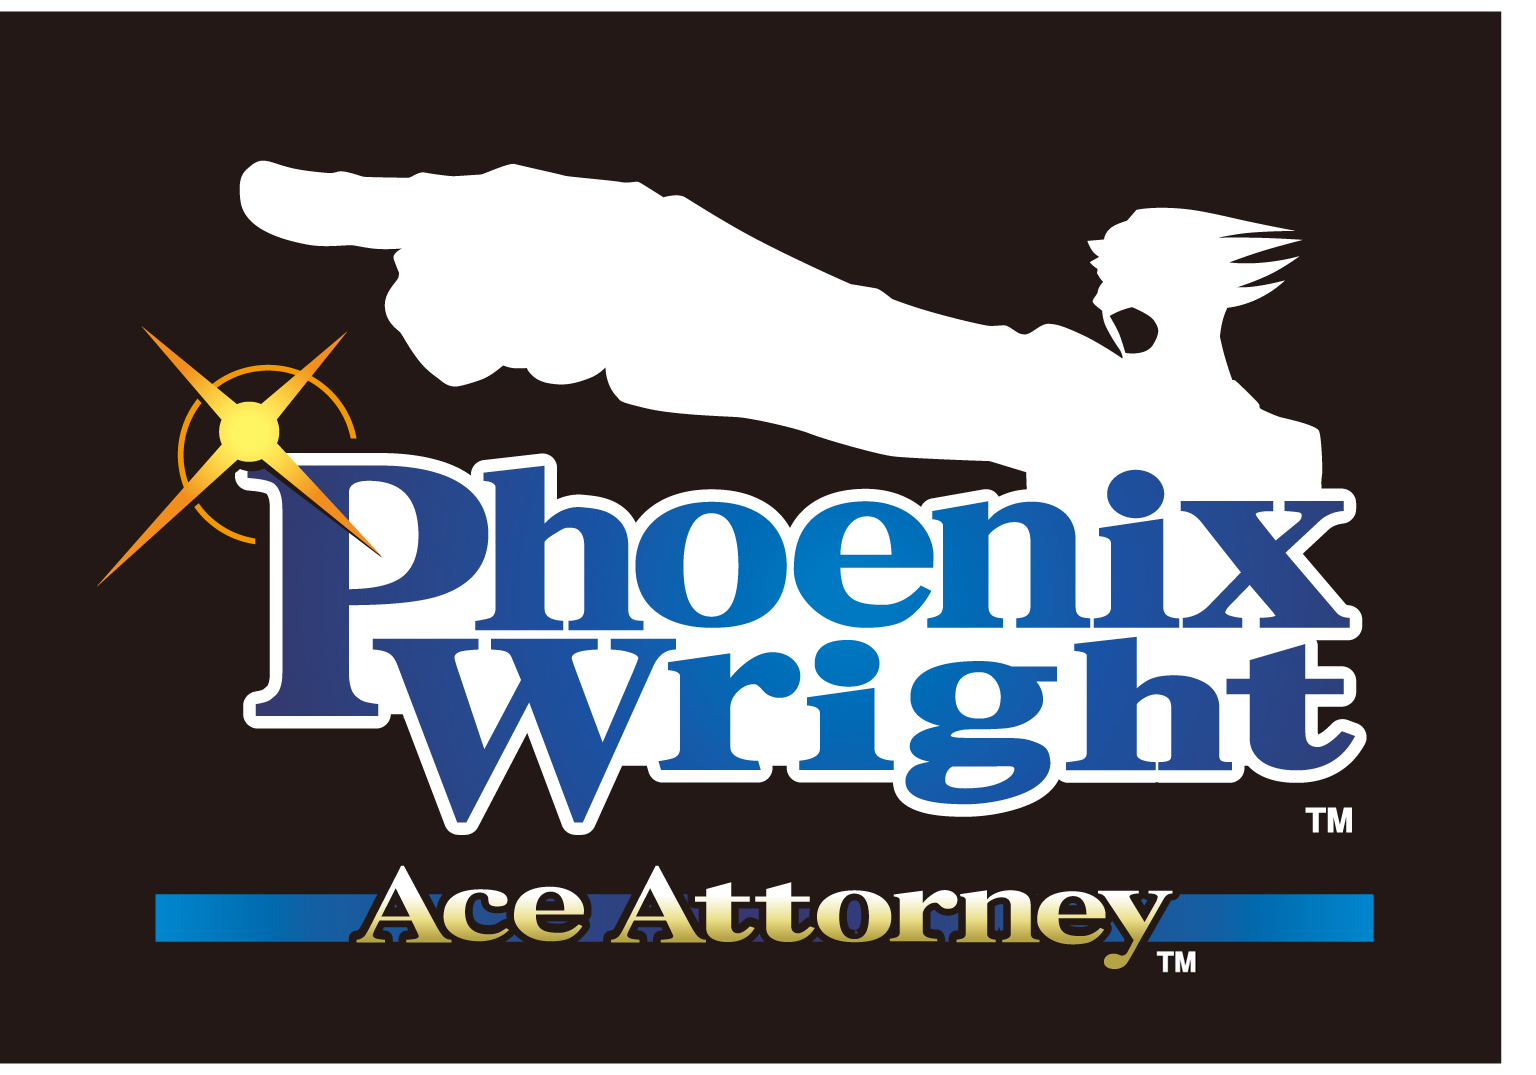 http://www.the-games-blog.com/wp-content/uploads/2010/02/PhoenixWrightAceAttorneyLogo.jpg